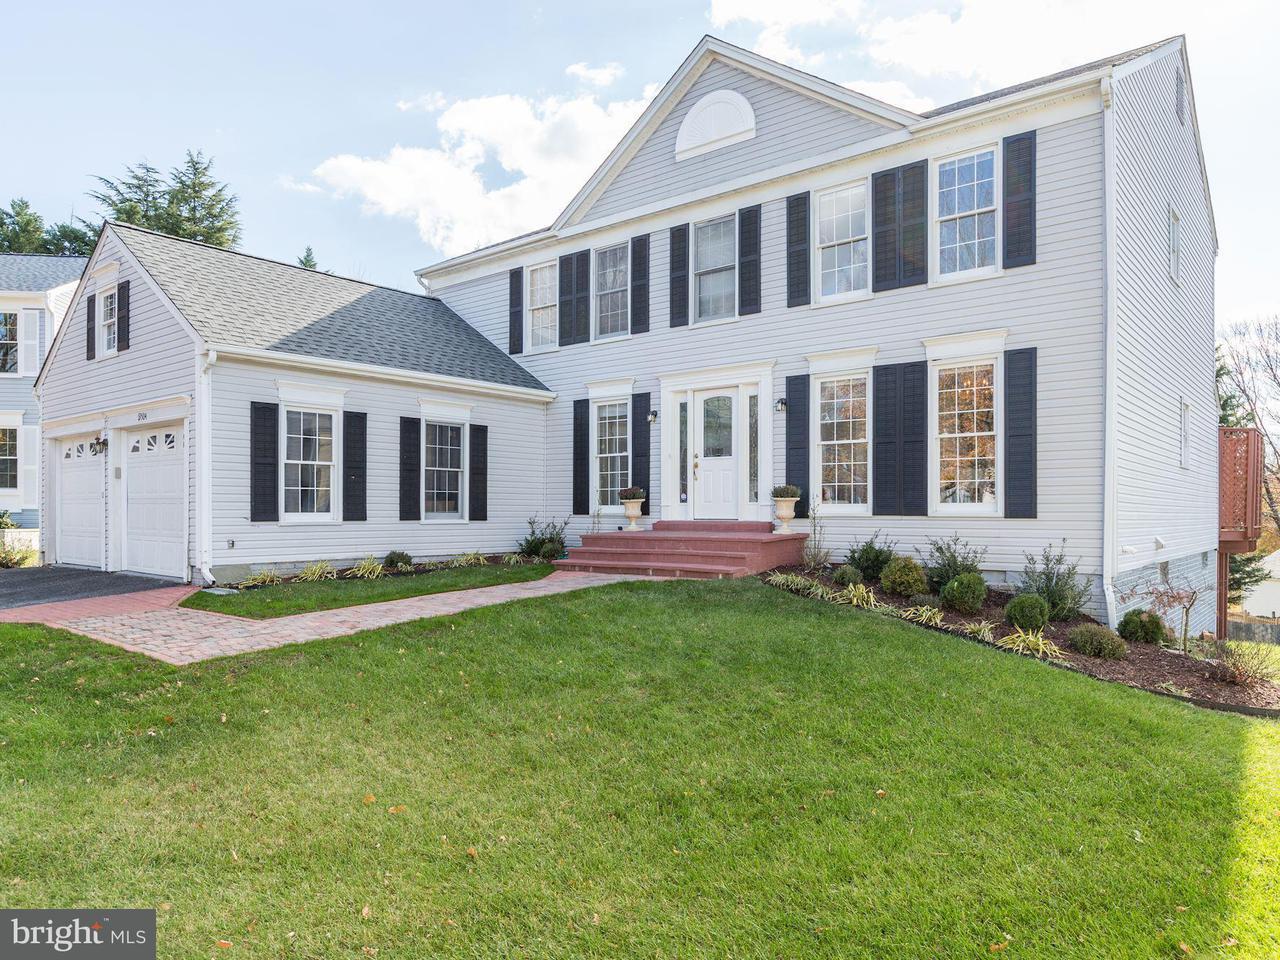 Single Family Home for Sale at 13504 Stockbridge Court 13504 Stockbridge Court Silver Spring, Maryland 20906 United States